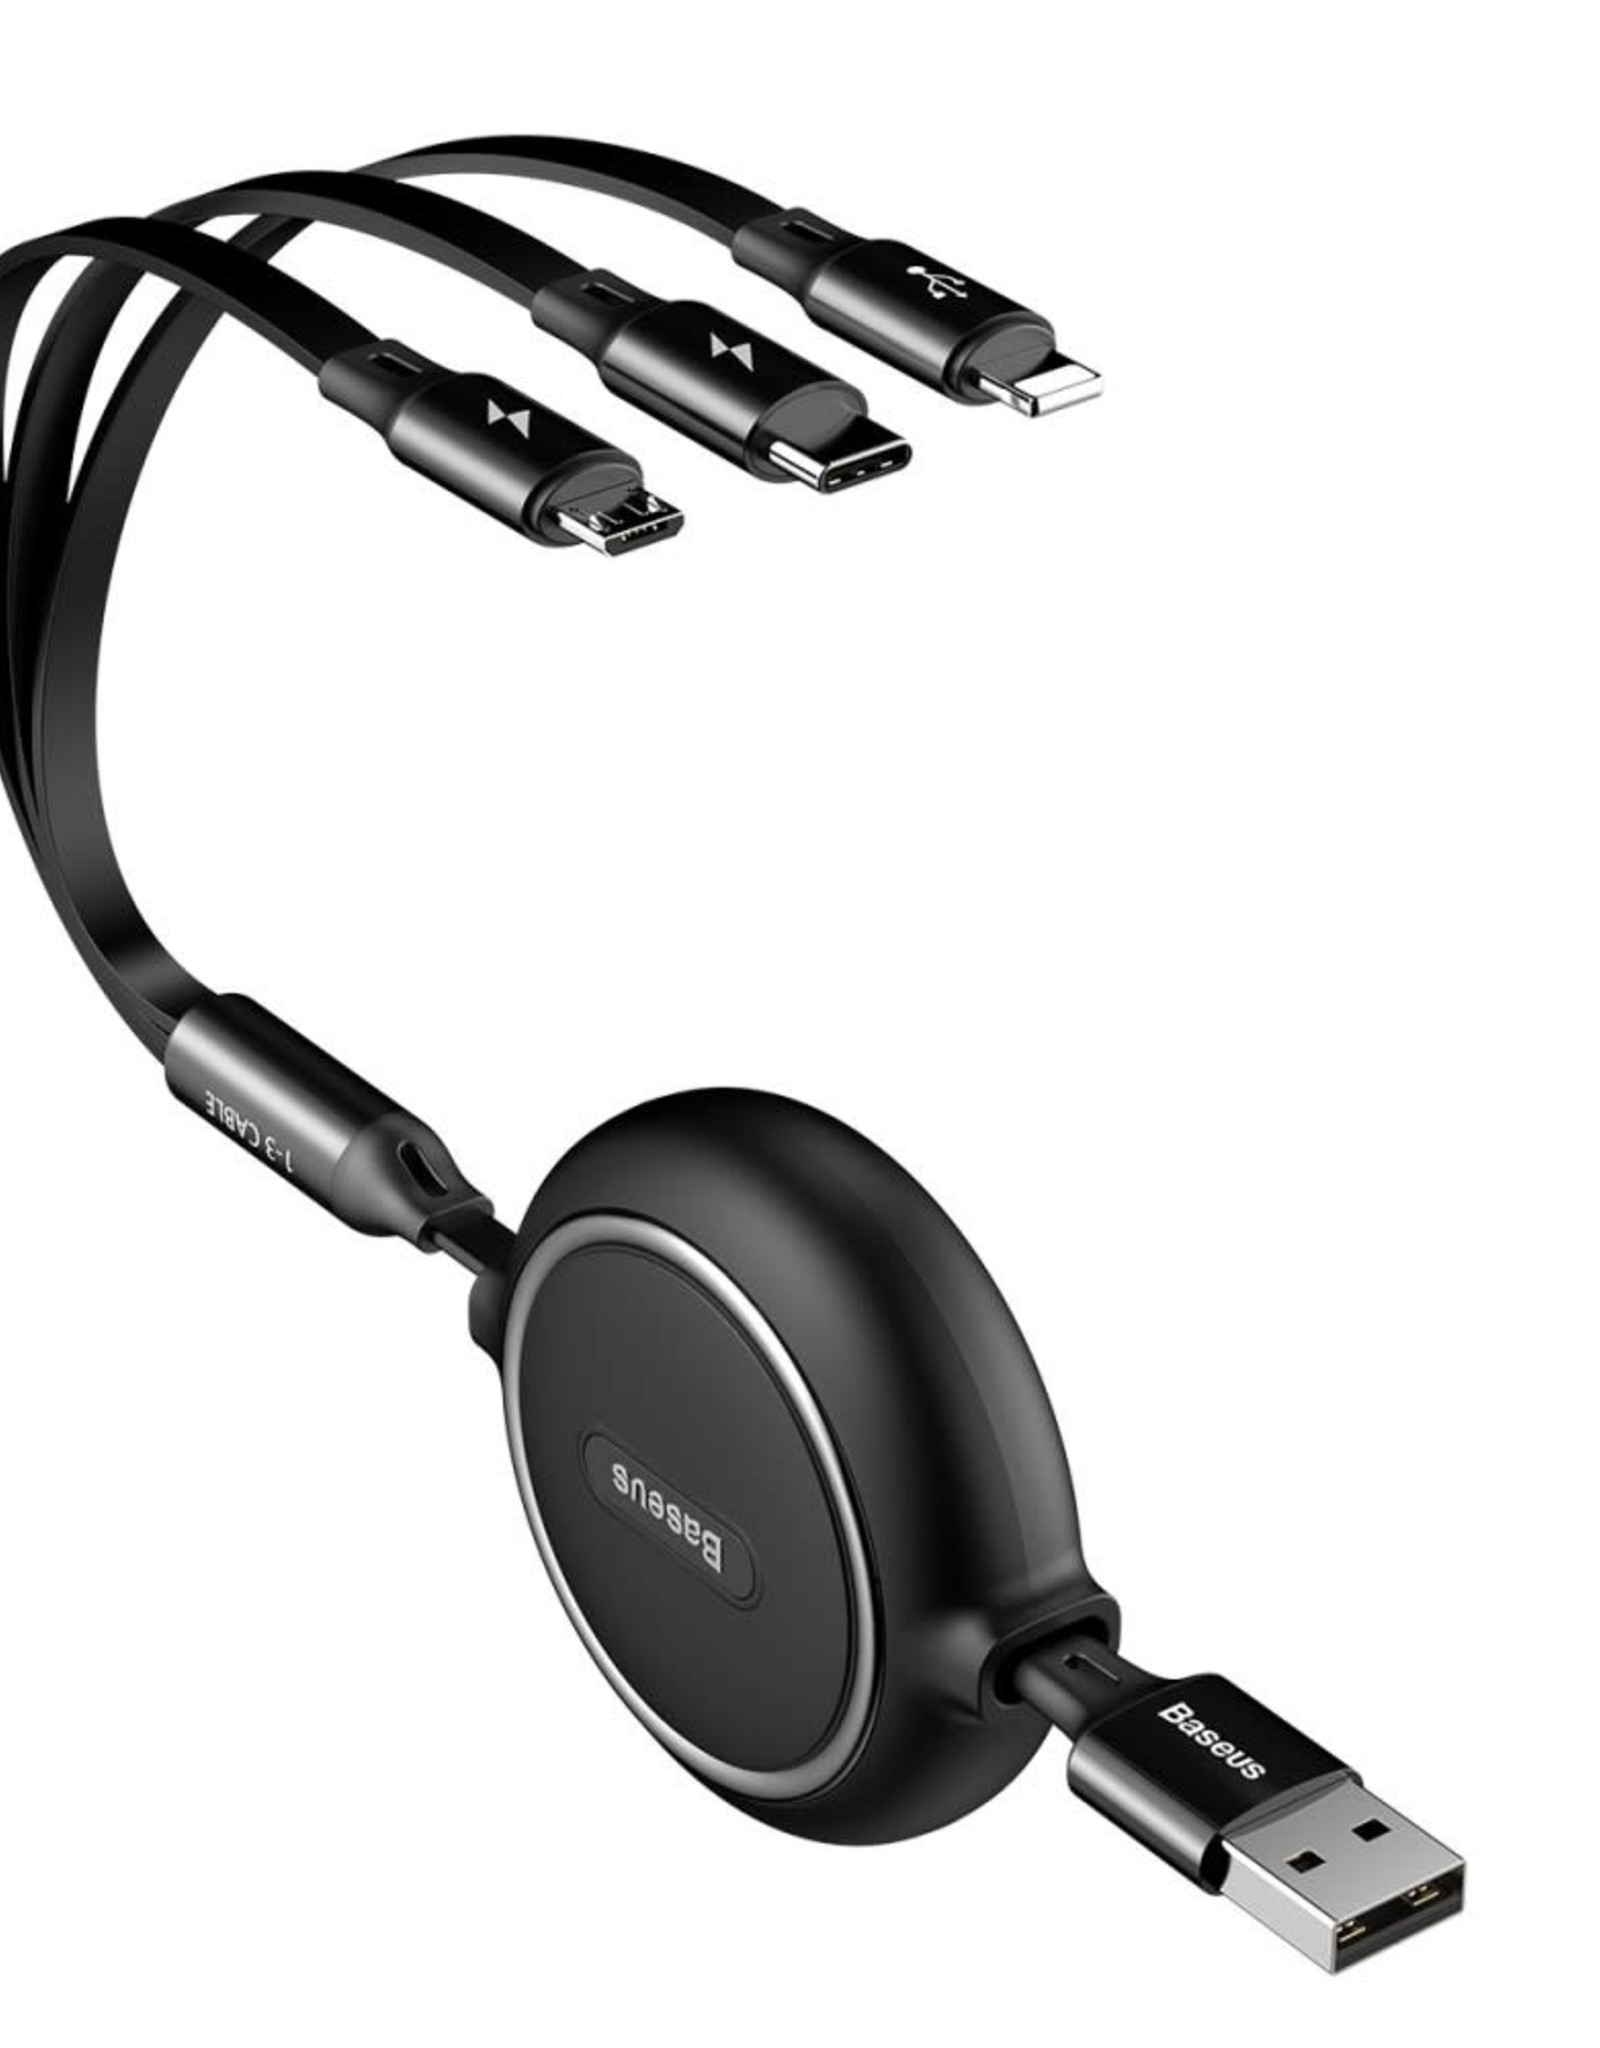 BASEUS Golden Loop 3.5A 1.2m Retractable USB 3-in-1 Lightning + Micro USB + Type-C Elastic Data Cable - Black